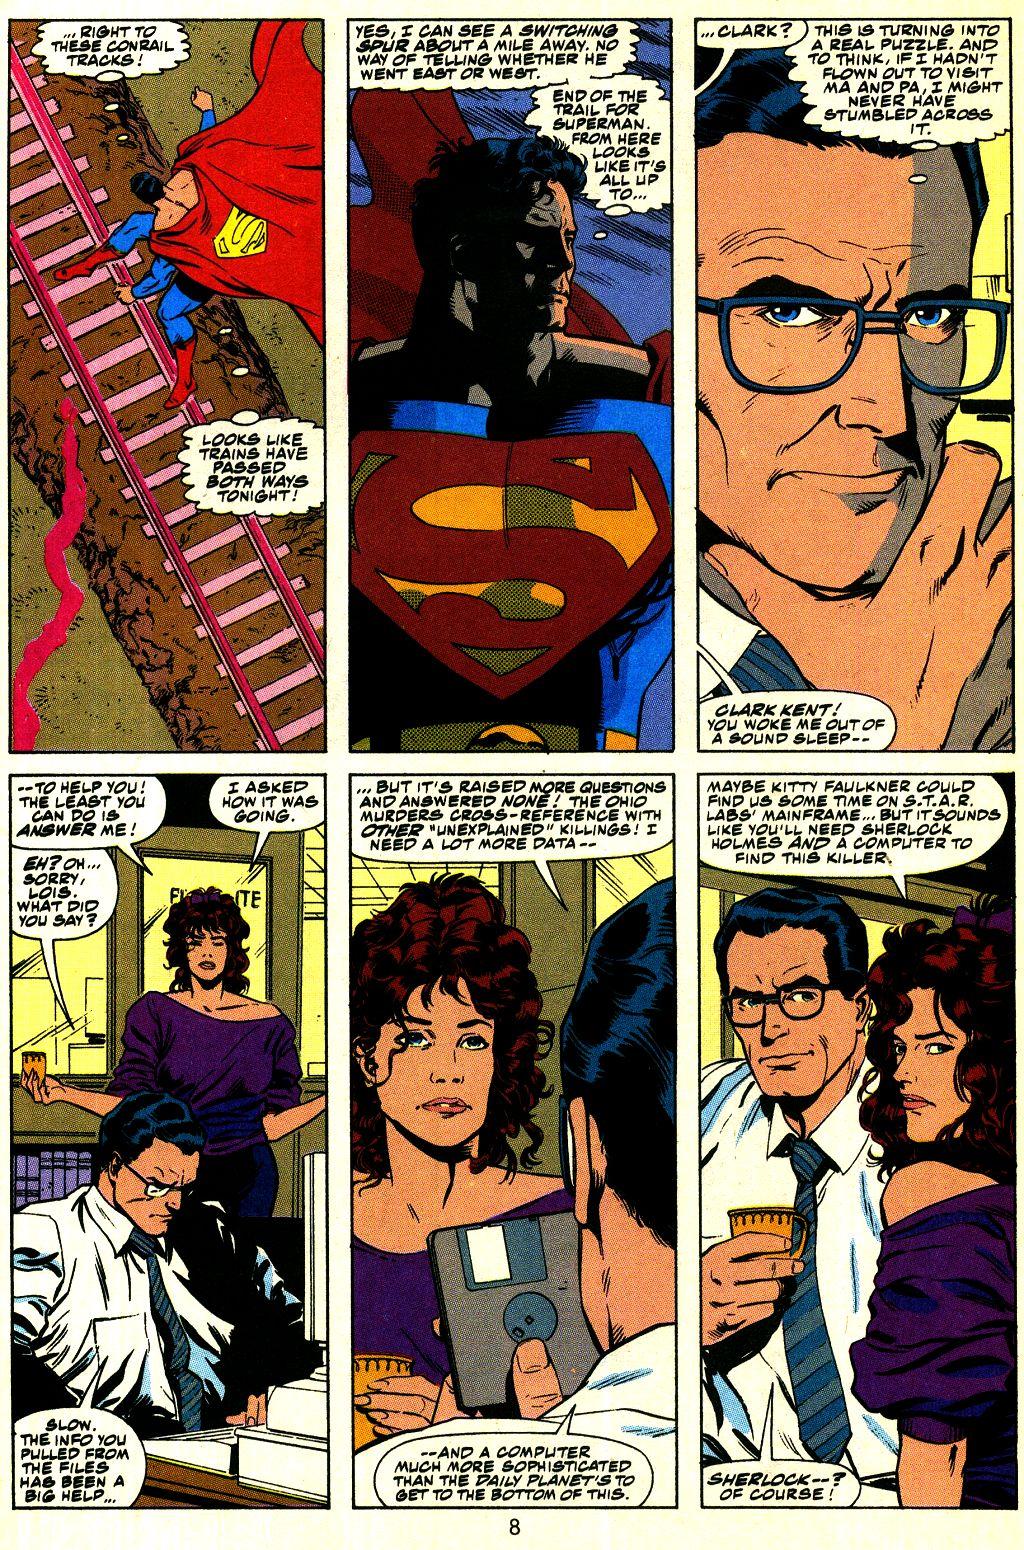 Action Comics (1938) 683 Page 8